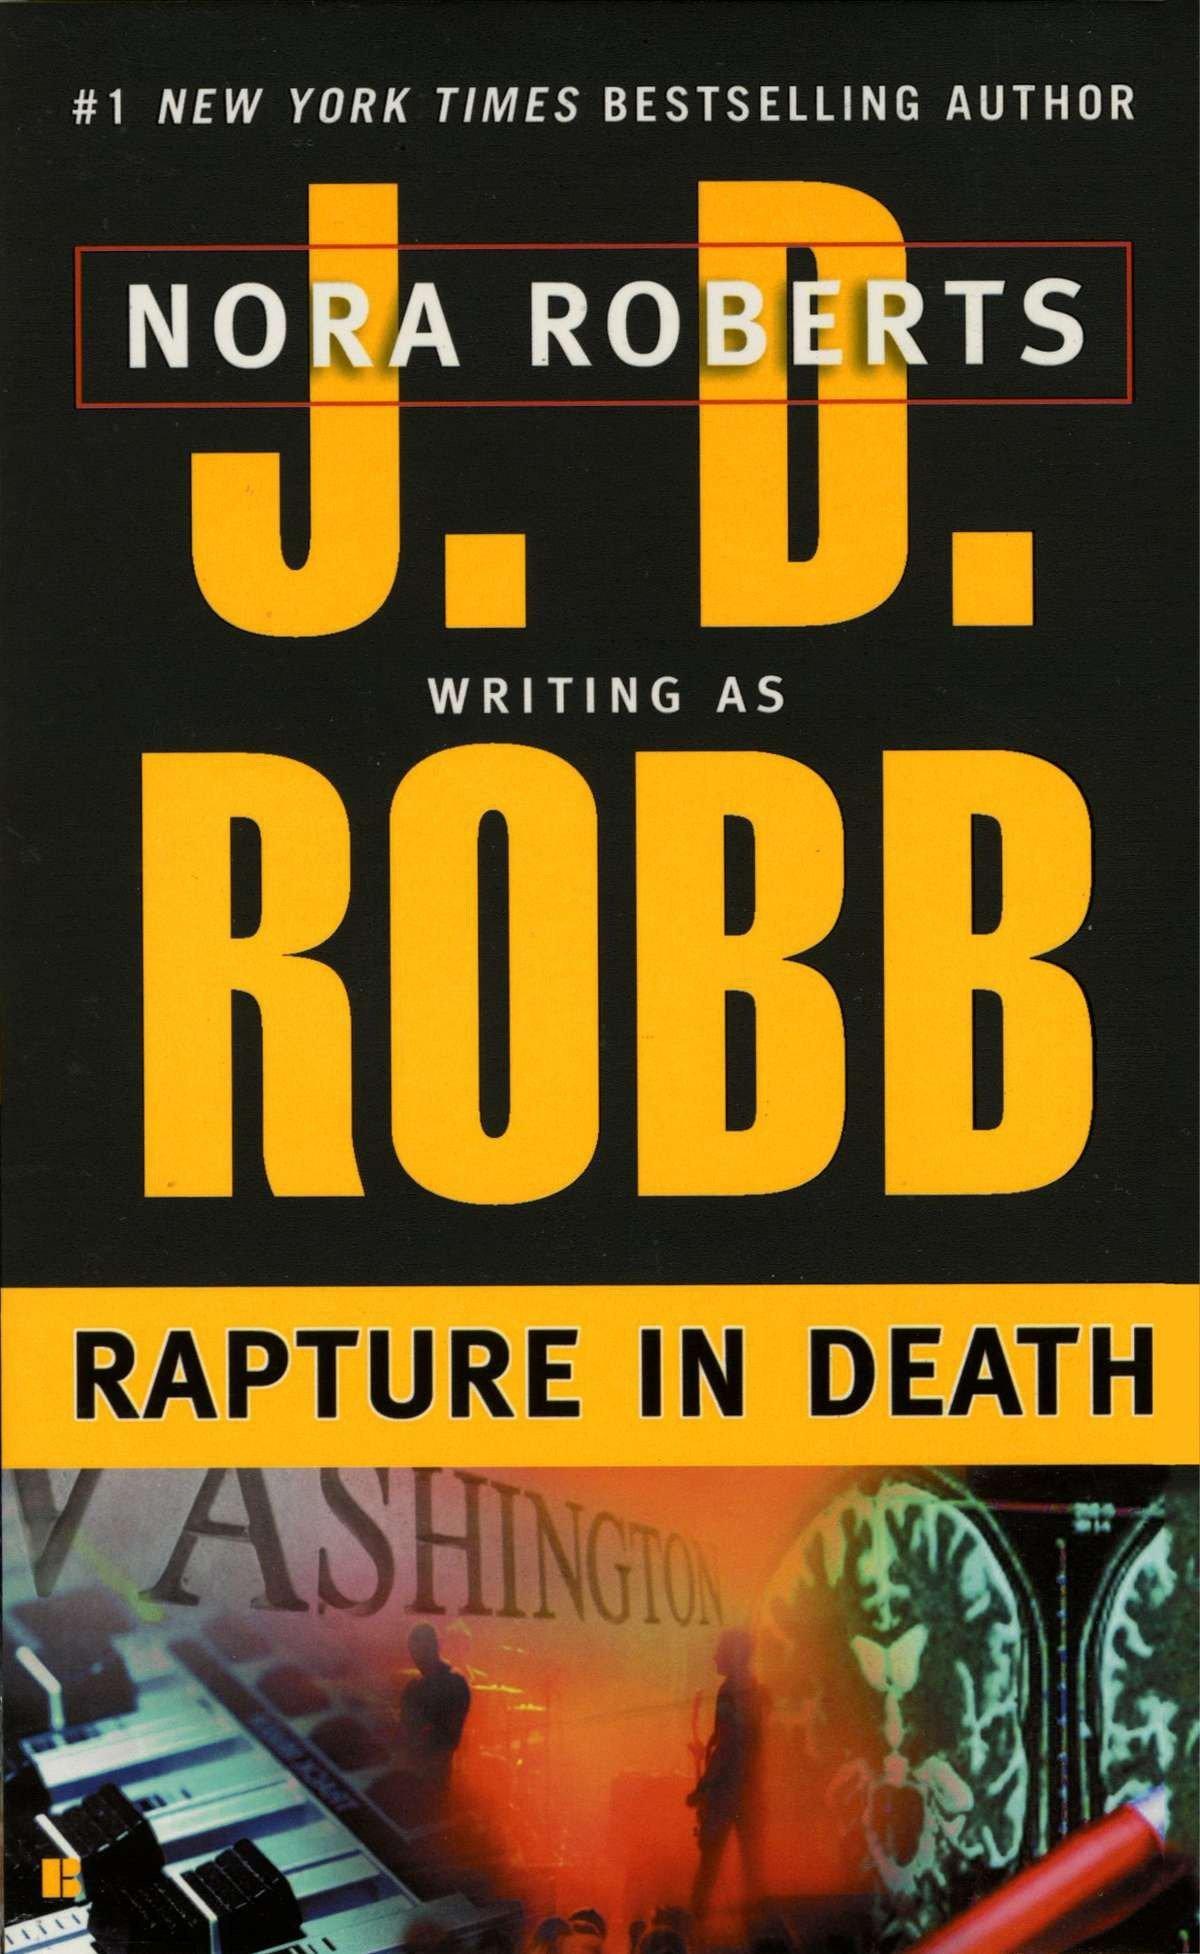 Rapture in Death